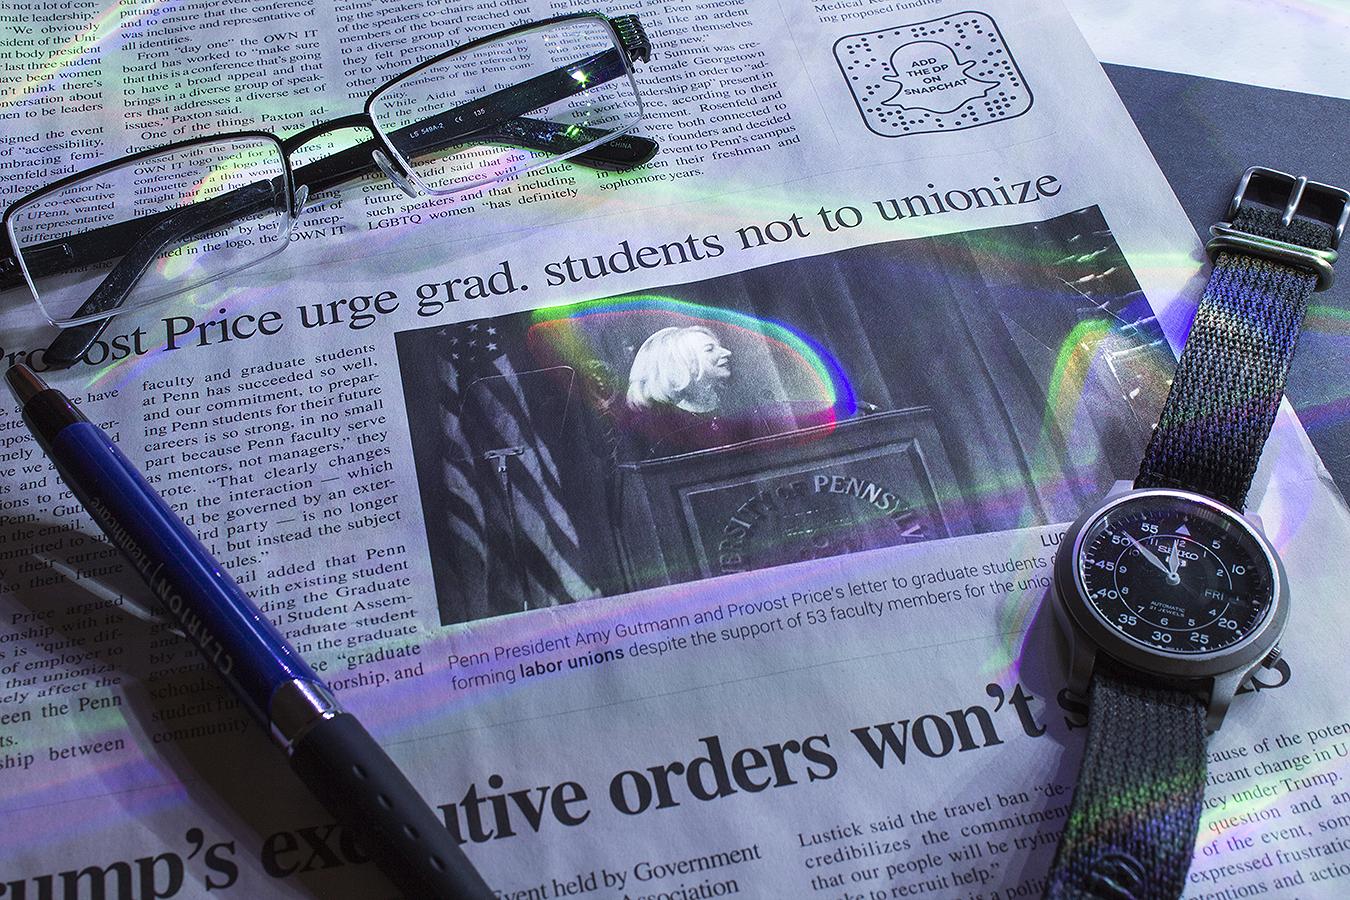 6_Newspaper_Jonathan_Tang_UPenn_Tony_Ward_Studio_Long_Exposure_Low_Light_LED_Optics_Origami_Paper_Pen_Watch_Glasses_Gutmann